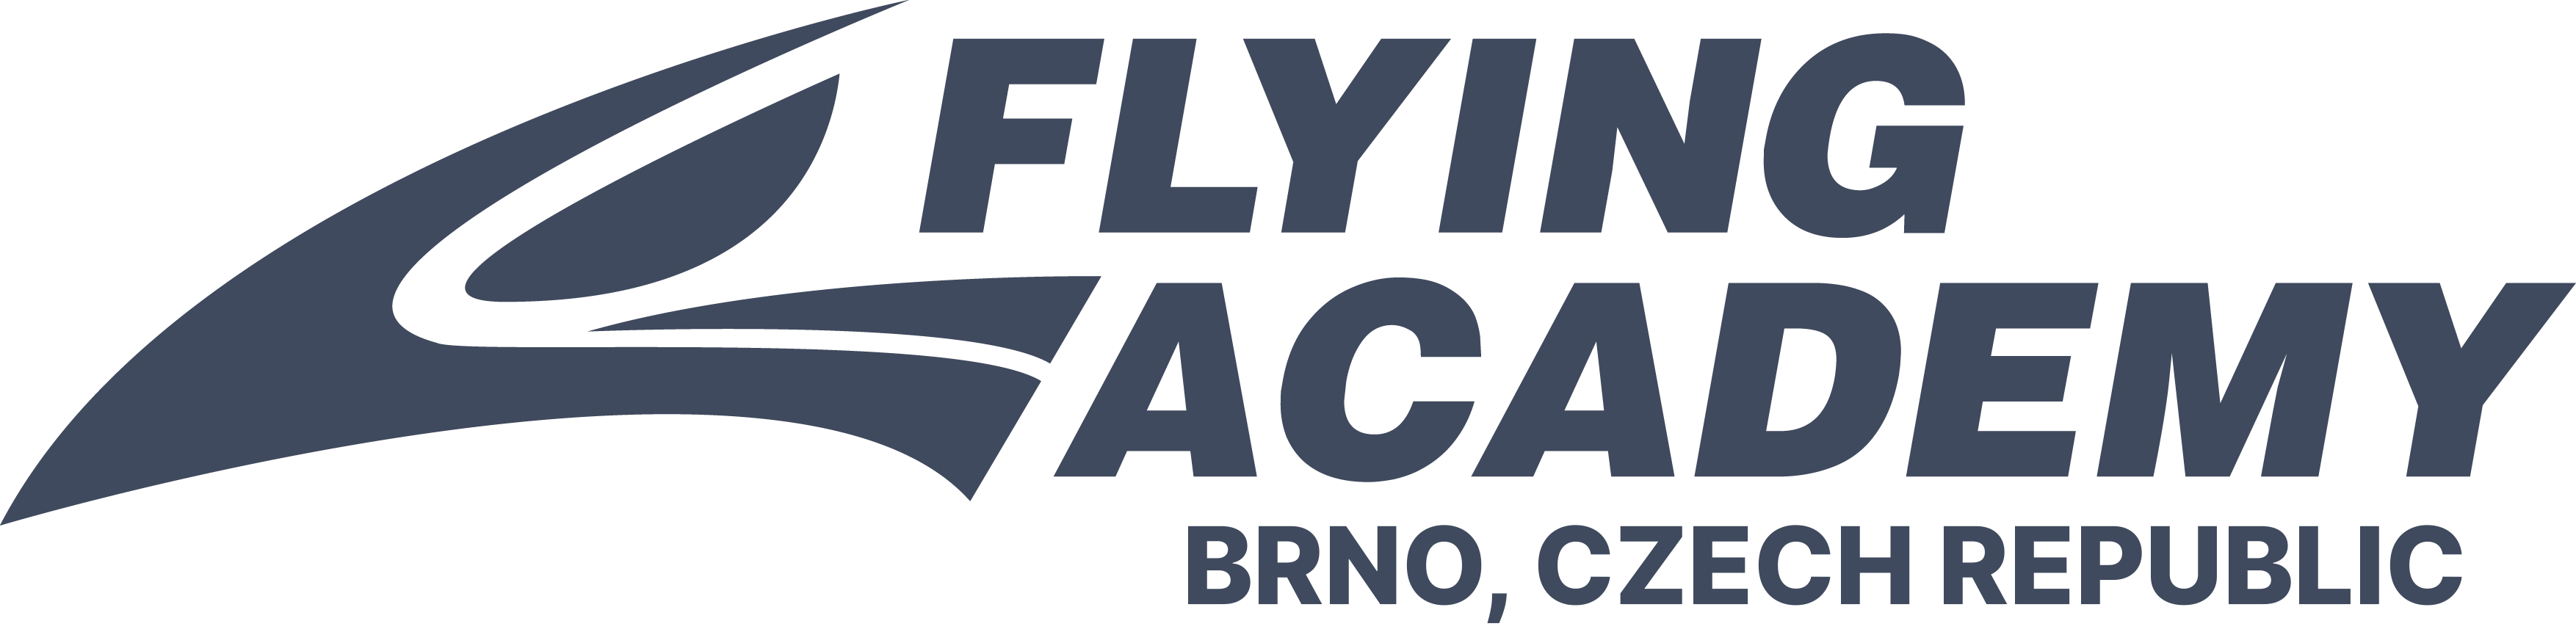 Flying Academy Brno | Professional Pilot Training